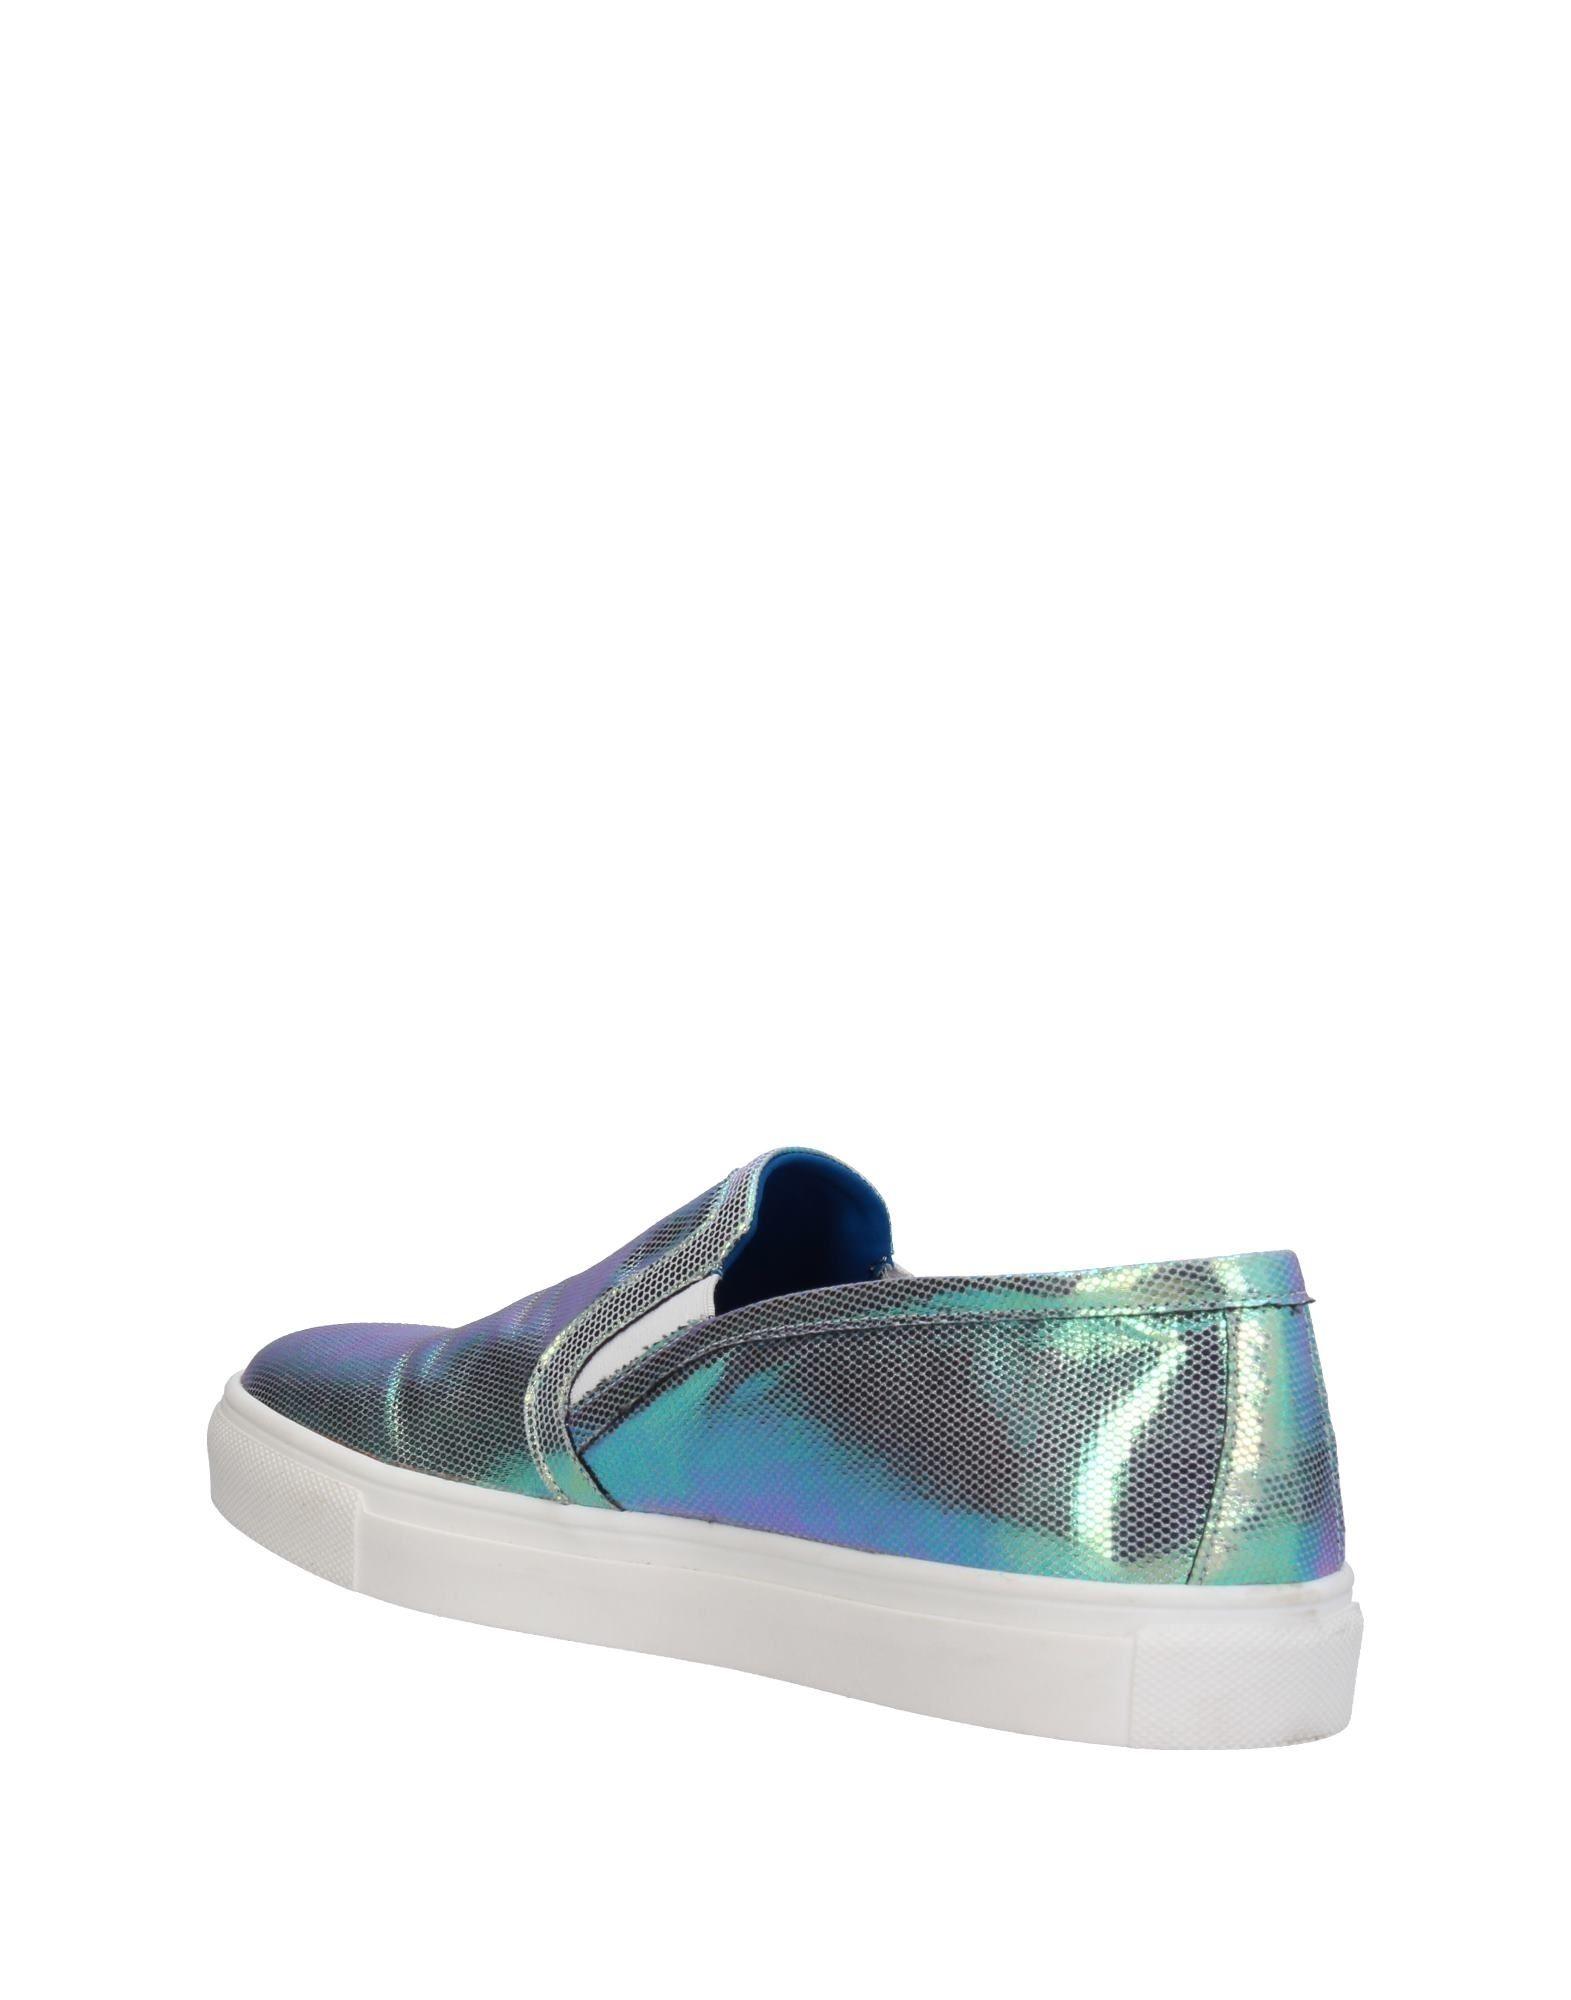 ... Sneakers Albano Femme - Sneakers Albano sur ...